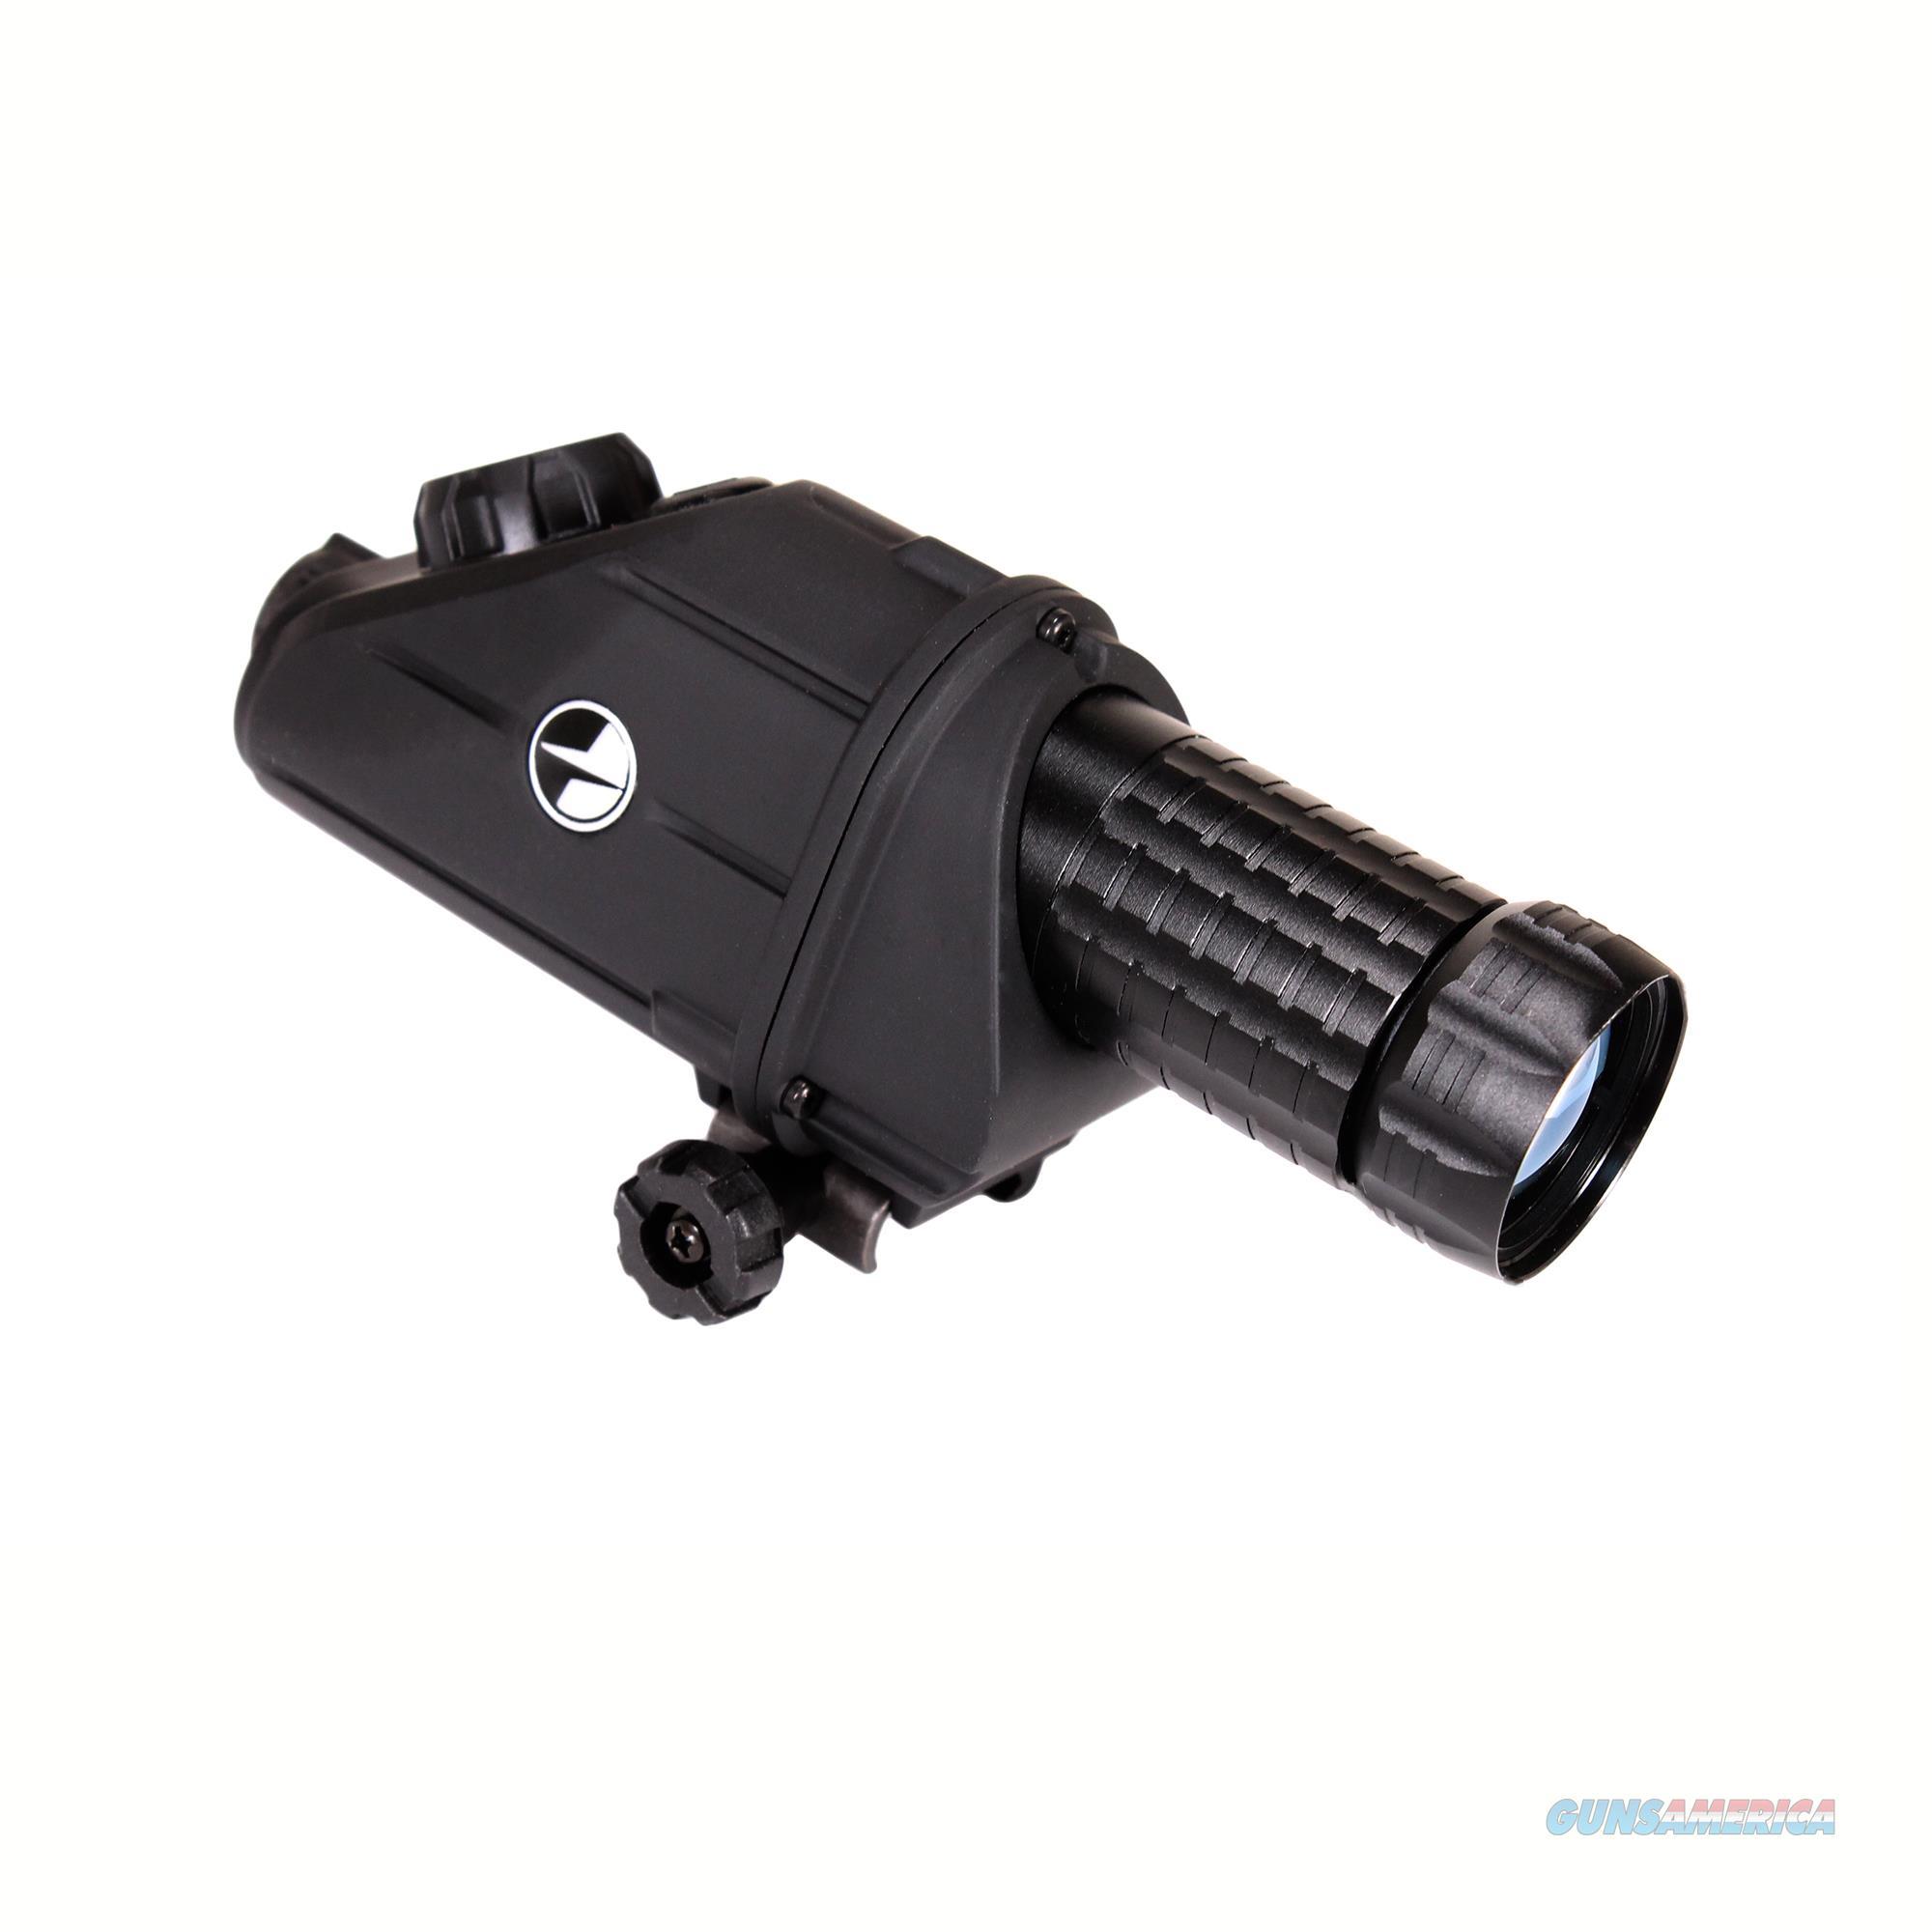 Pulsar Al-915 Ir Illuminator, Black PL79133  Non-Guns > Gun Parts > Misc > Rifles